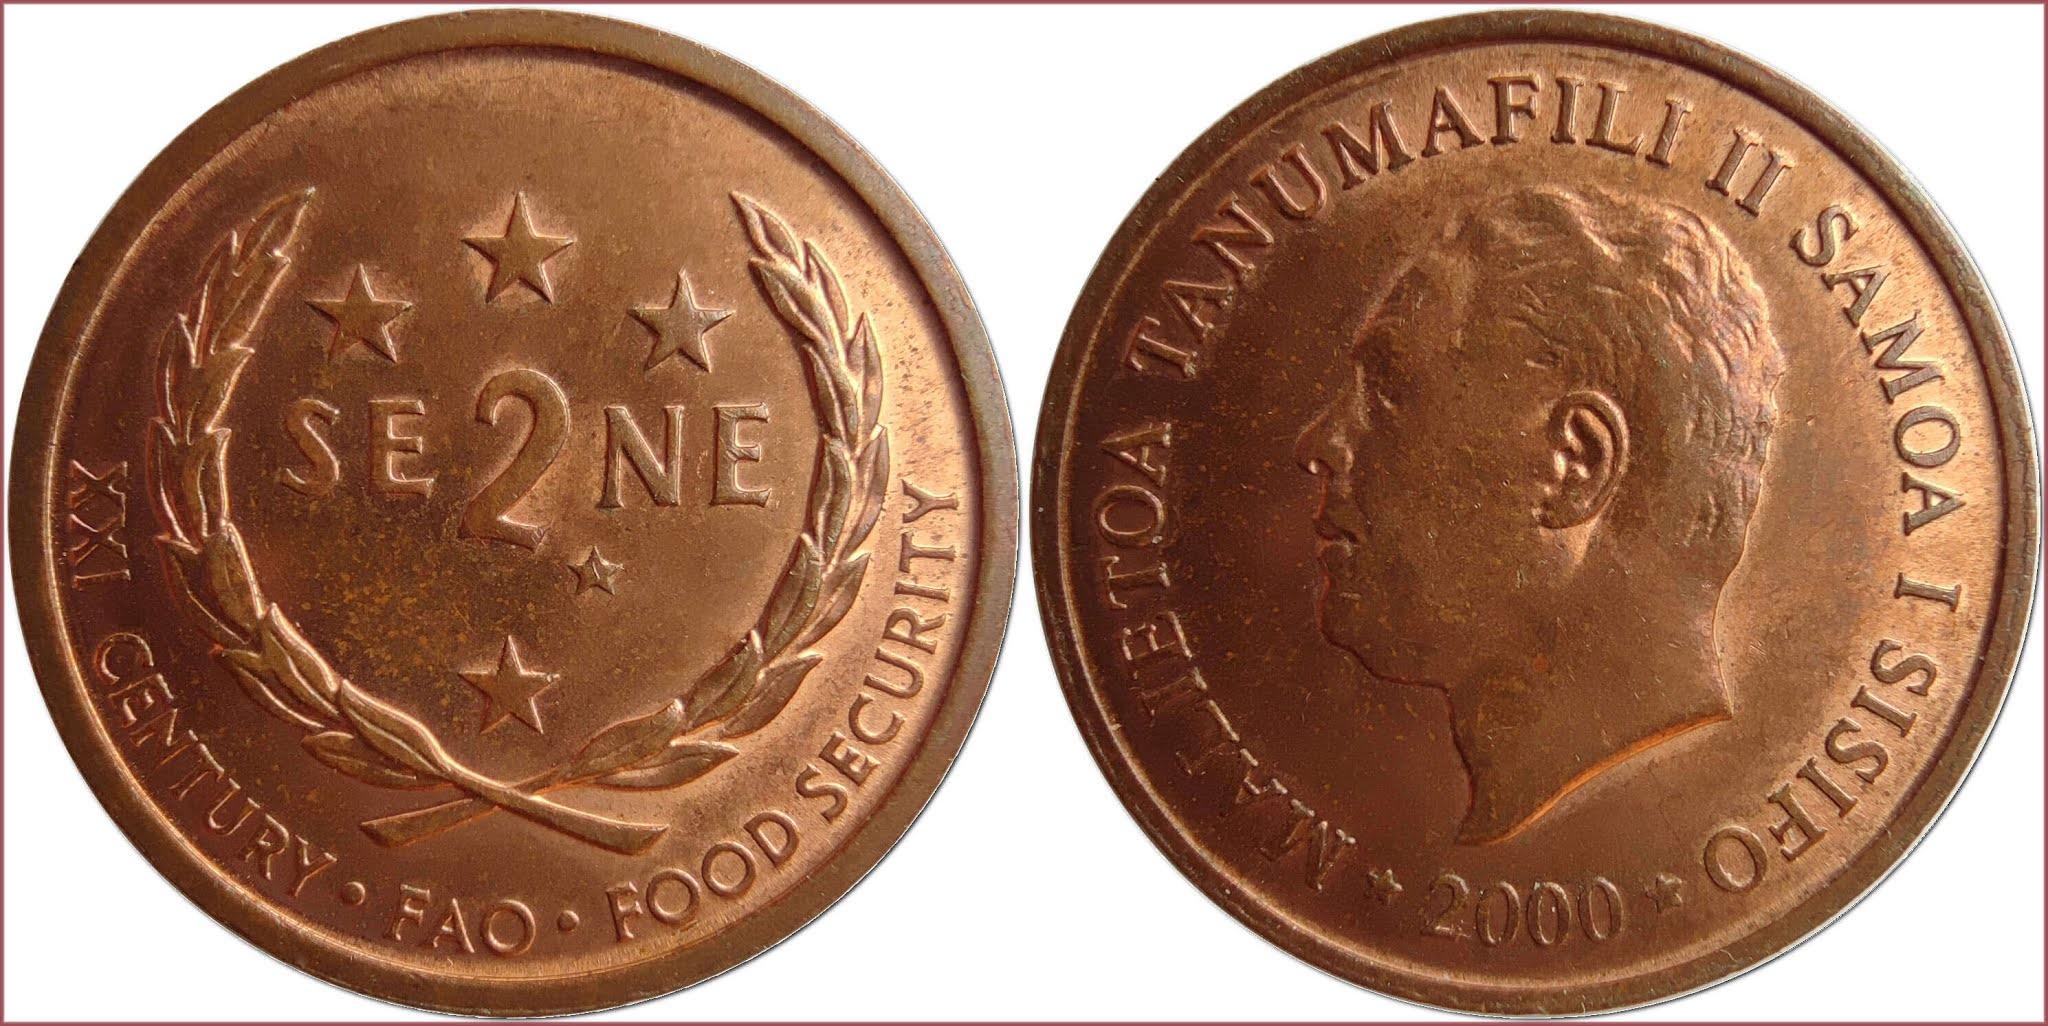 2 sene, 2000: Western Samoa (Independent State of Samoa)